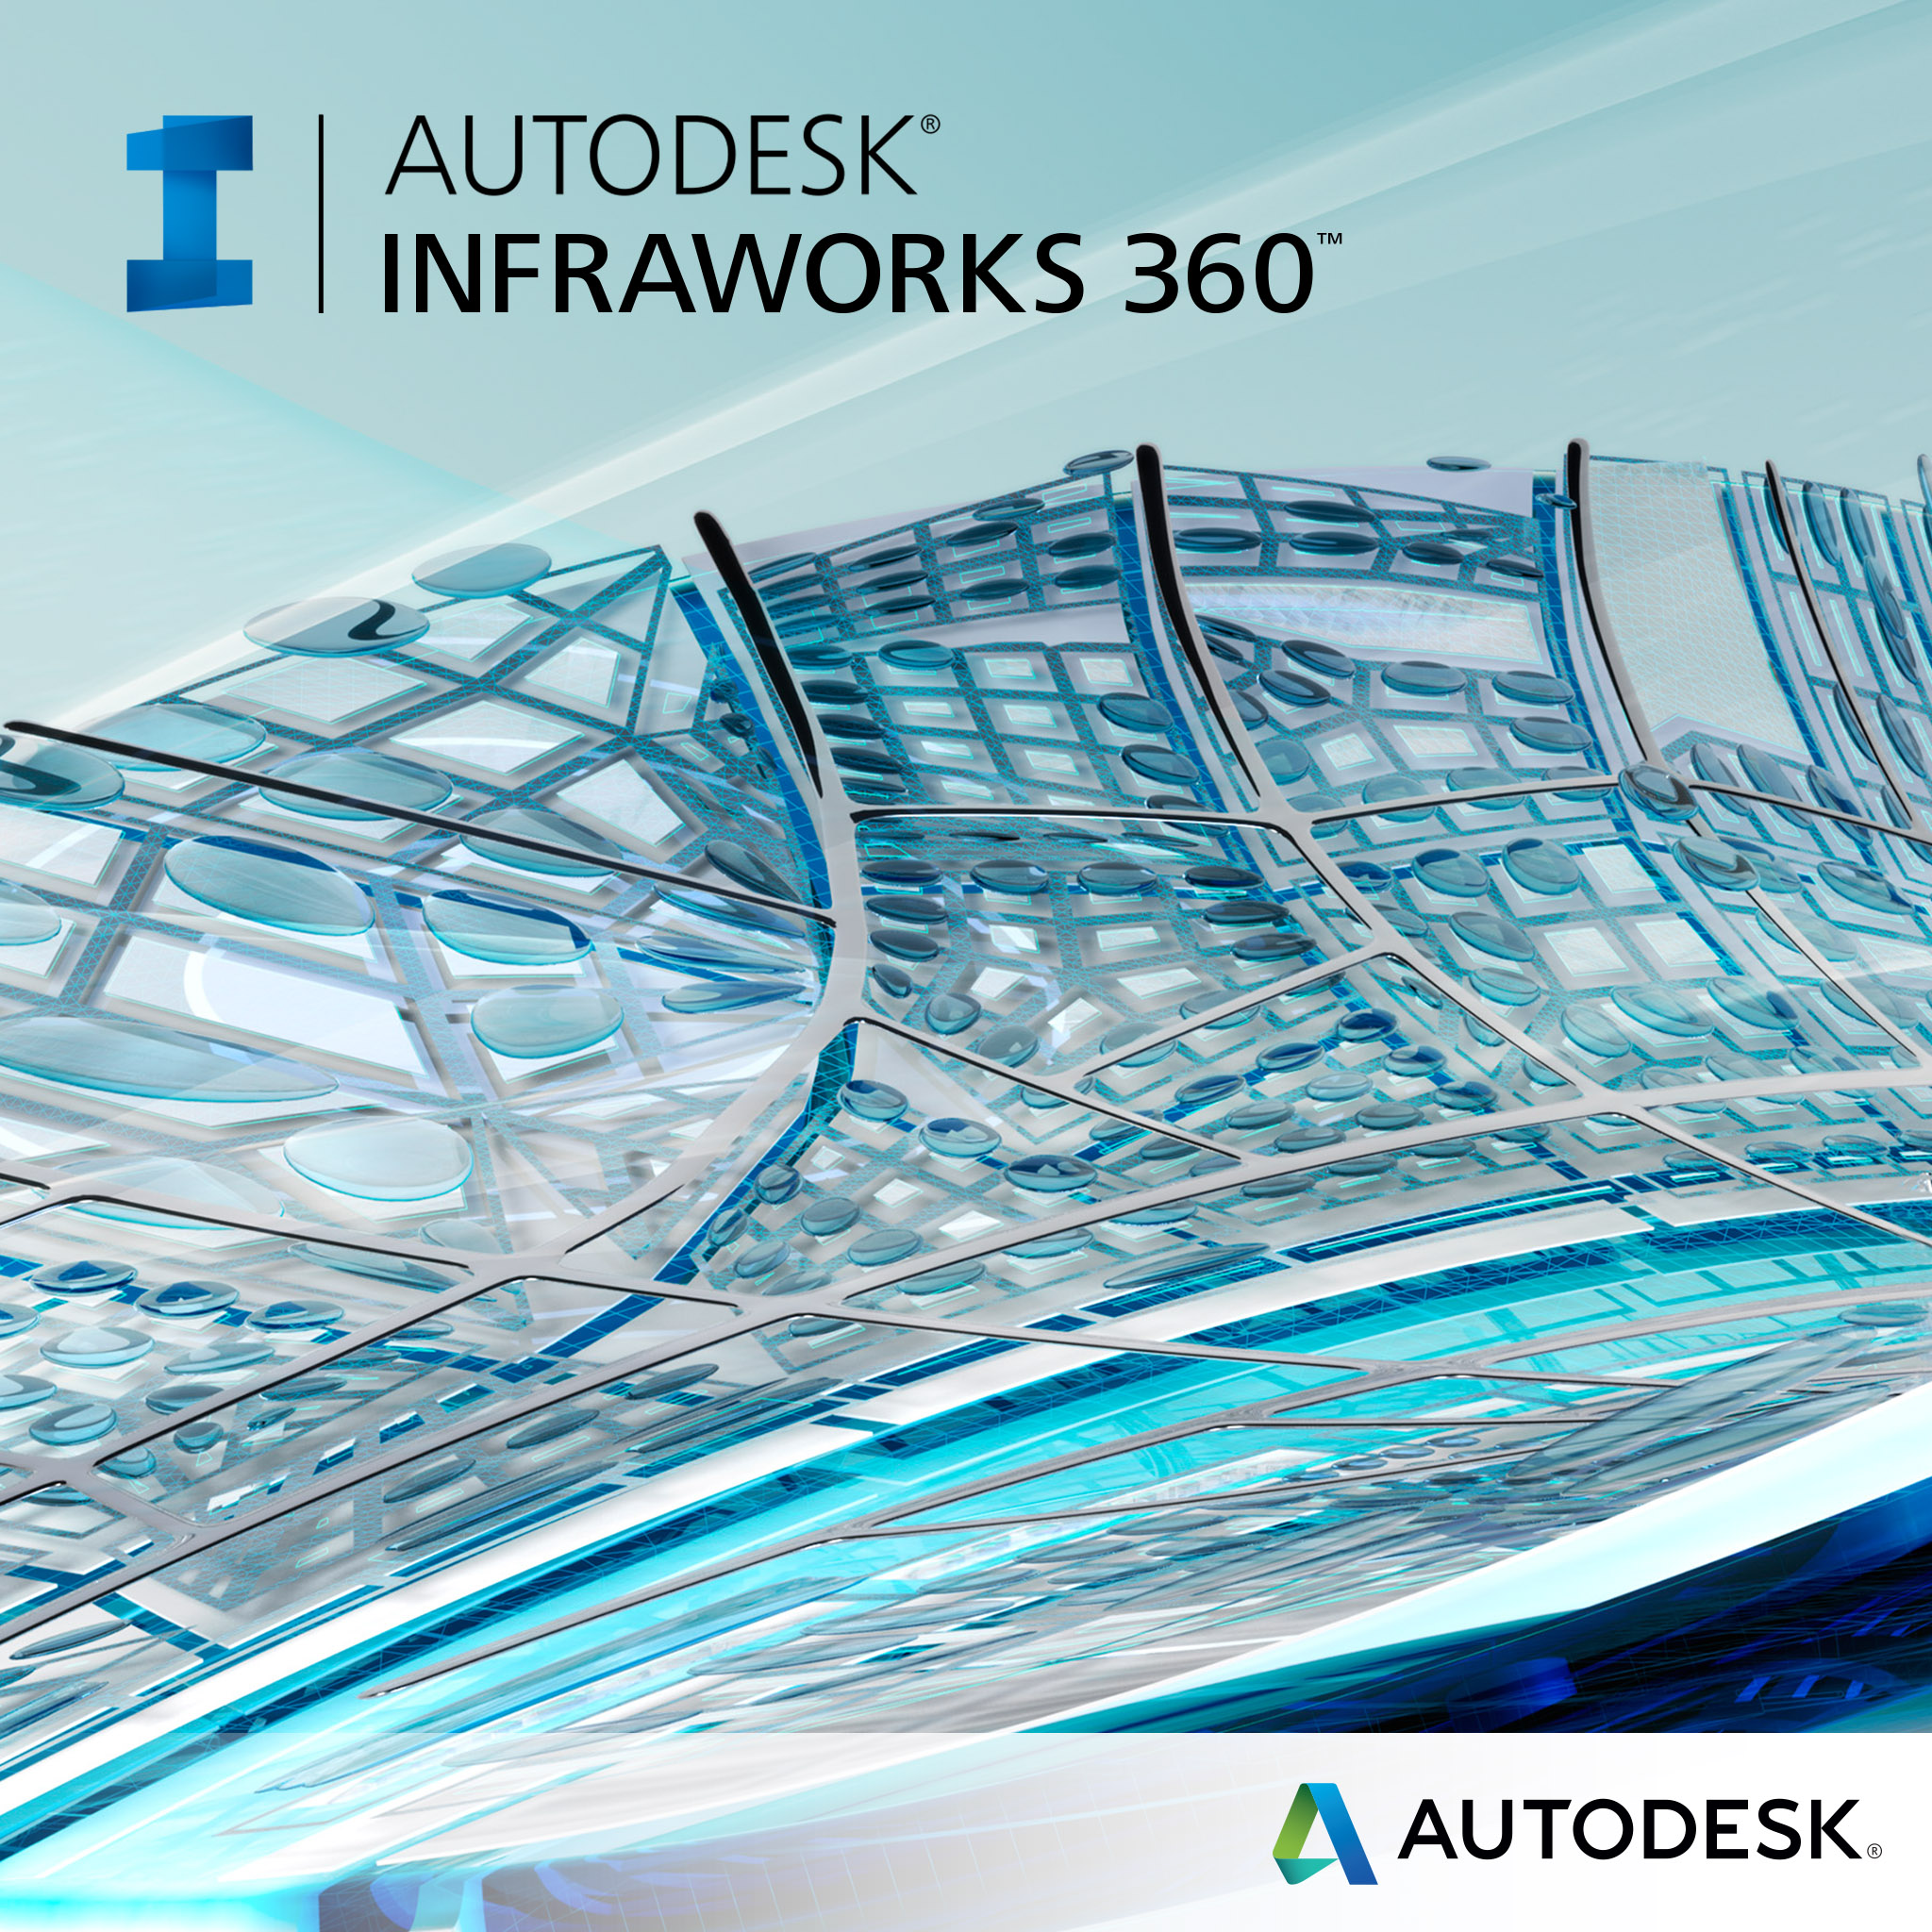 INFRWORKS360